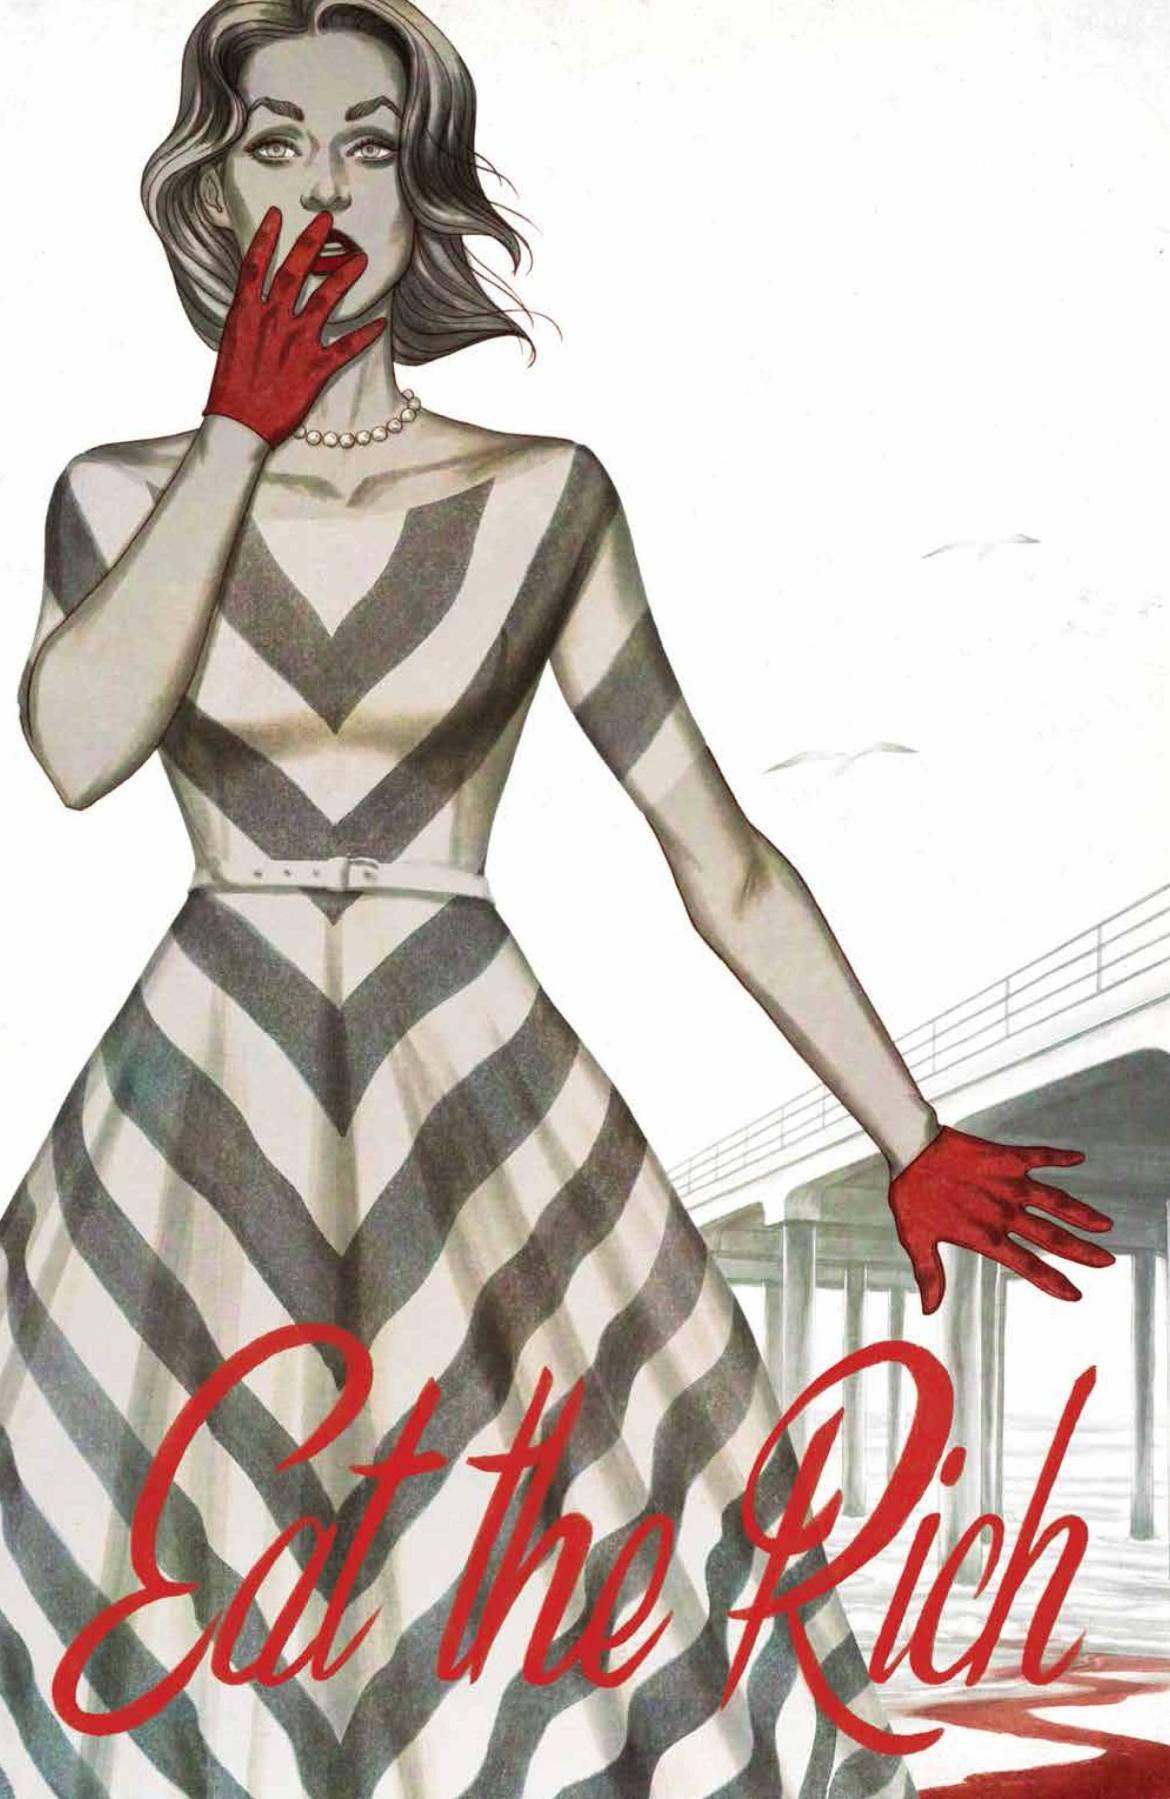 STL193841 ComicList: BOOM! Studios New Releases for 08/18/2021